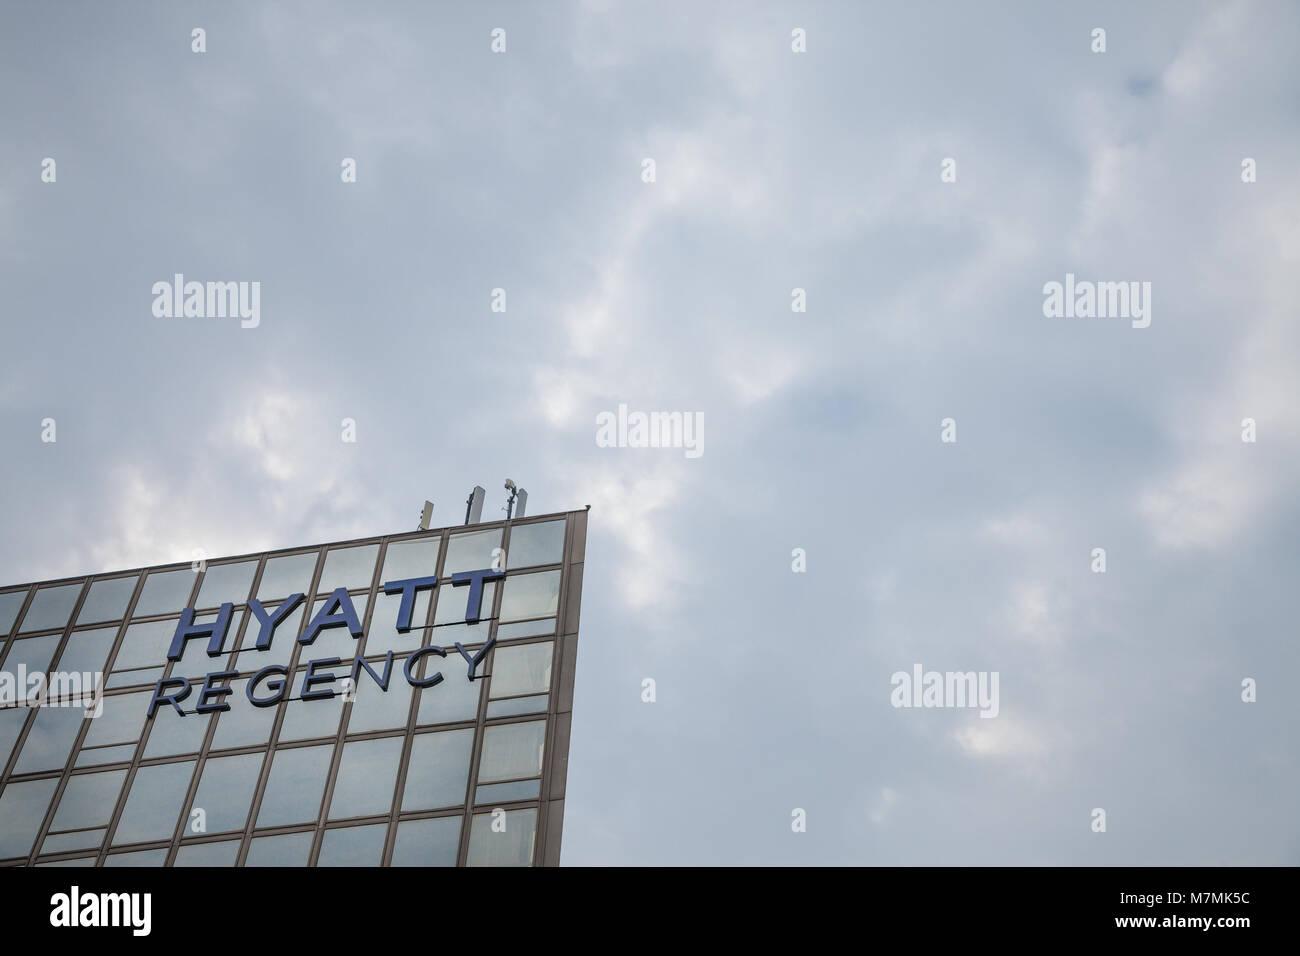 BELGRADE, SERBIA - MARCH 2, 2018: Hyatt Regency logo on their main hotel in Serbia. Hyatt Hotels Corporation is - Stock Image